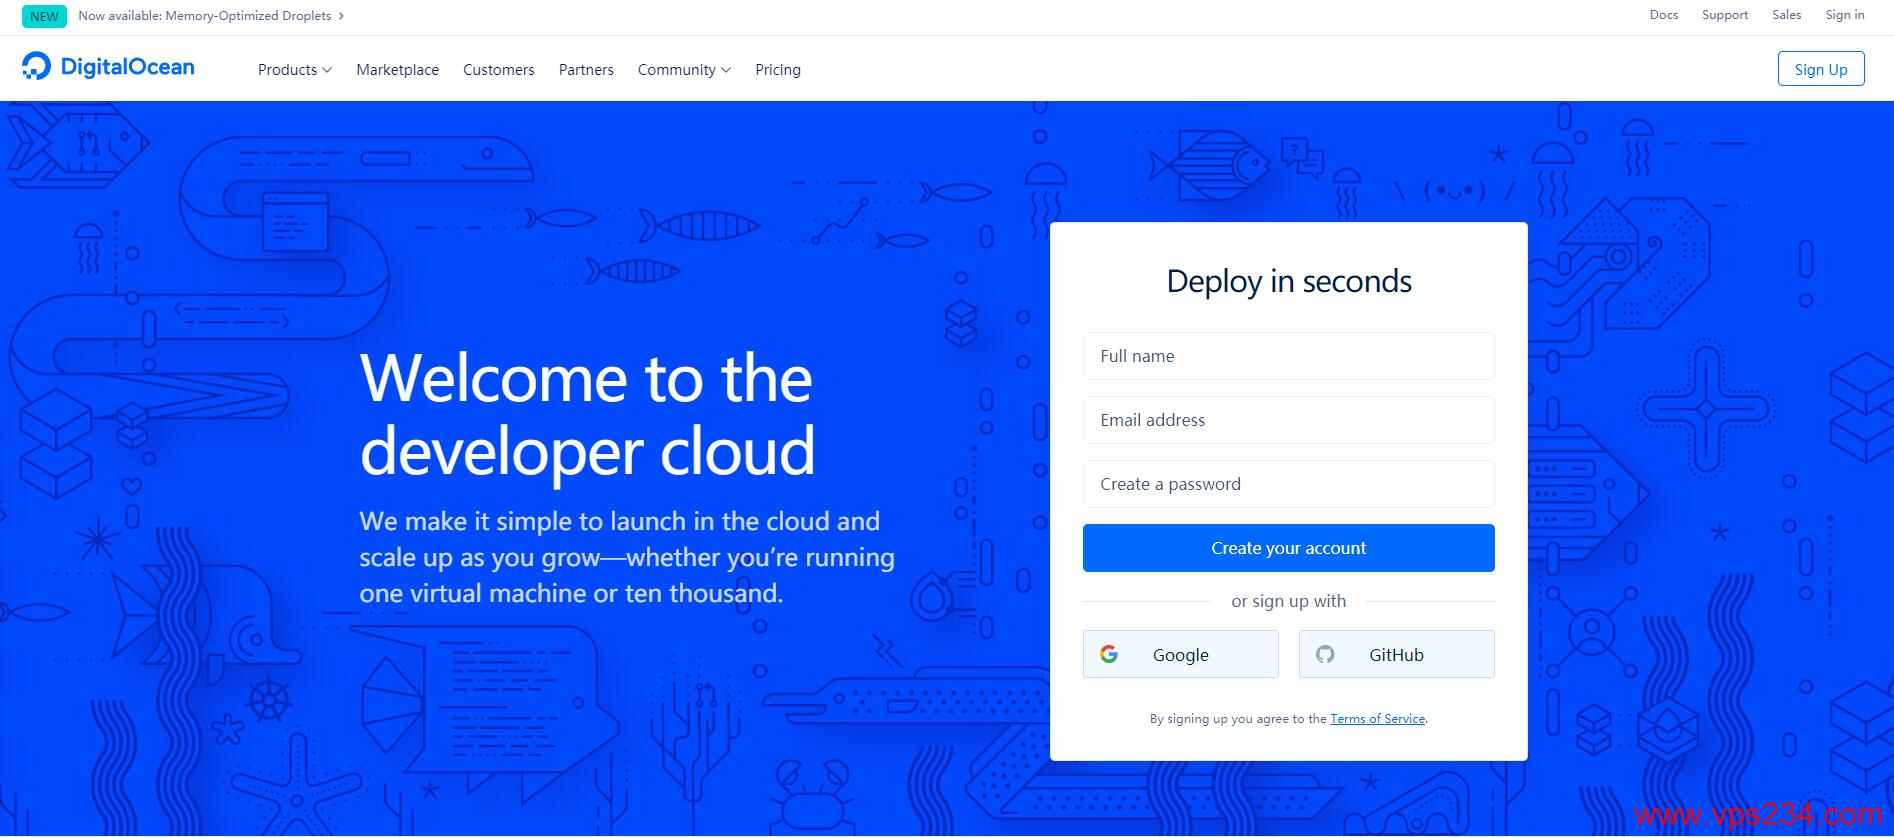 DigitalOcean - 全球第4大云服务商